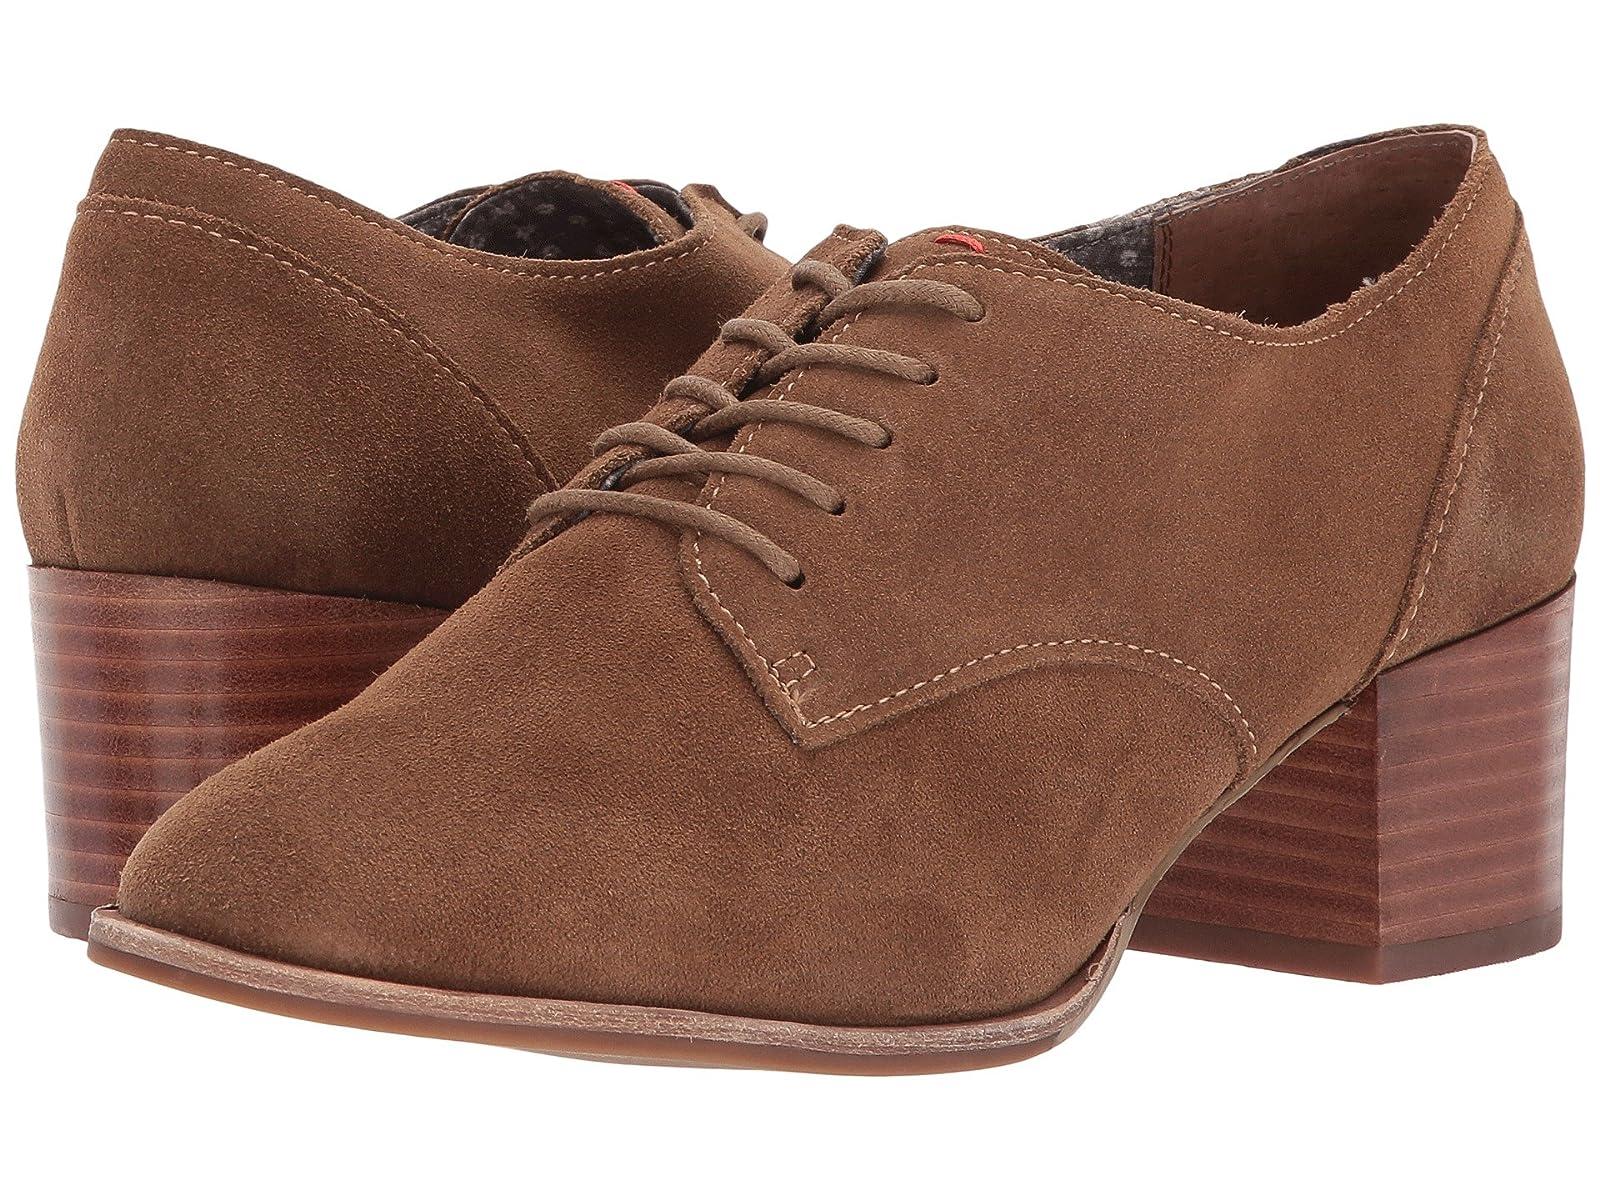 ED Ellen DeGeneres PhoebeCheap and distinctive eye-catching shoes